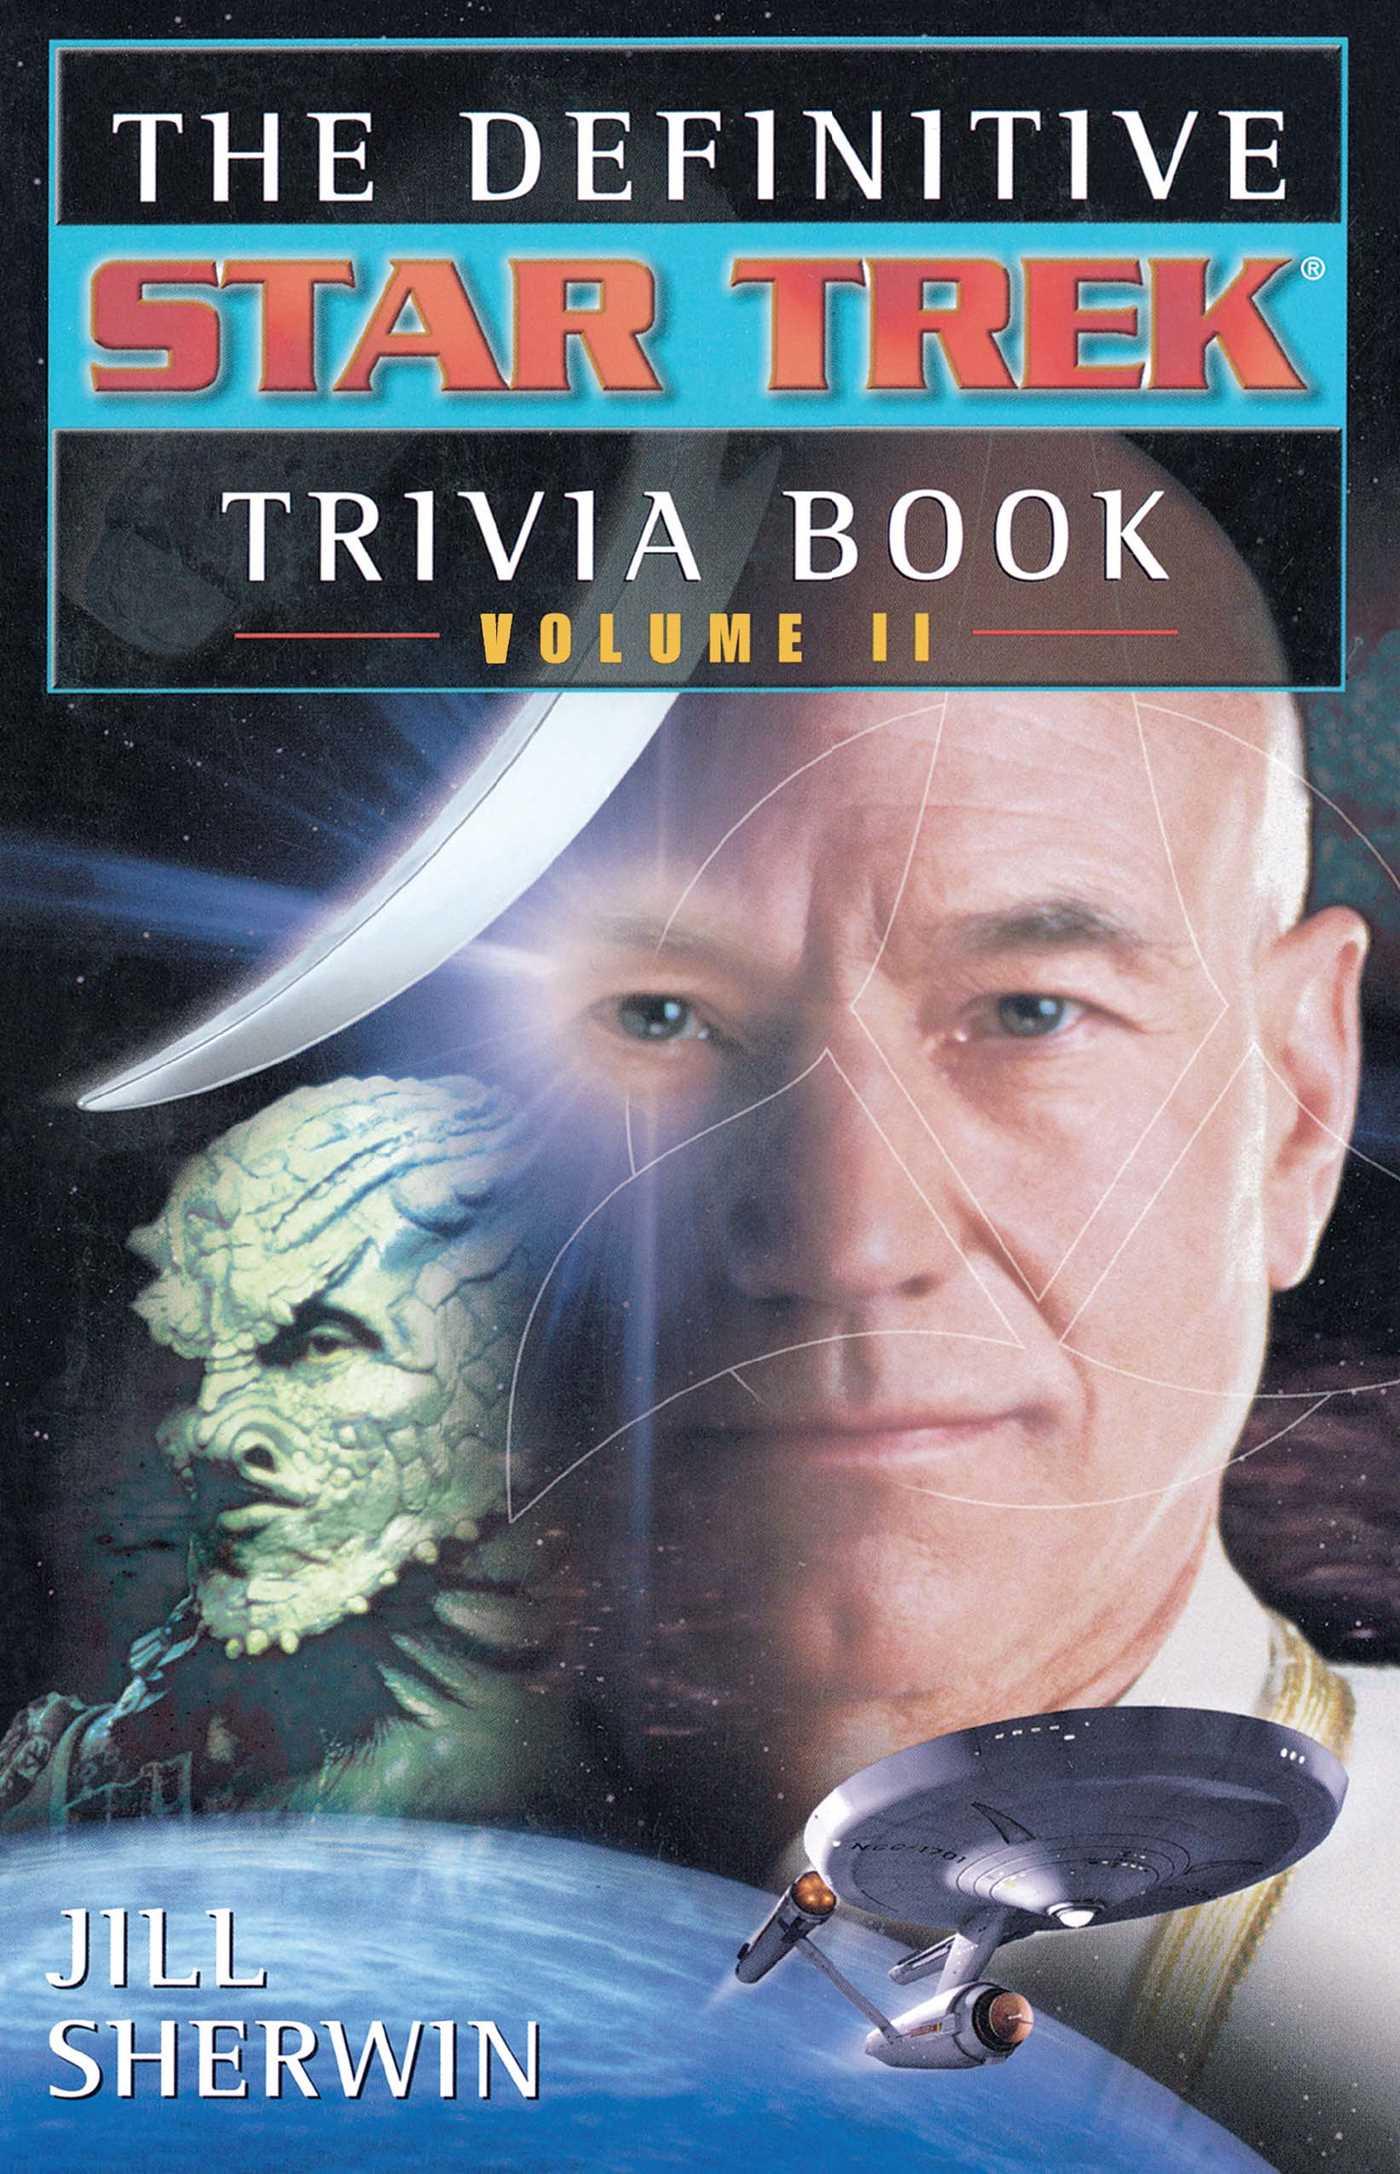 The star trek the definitive star trek trivia book volume ii 9780743412810 hr